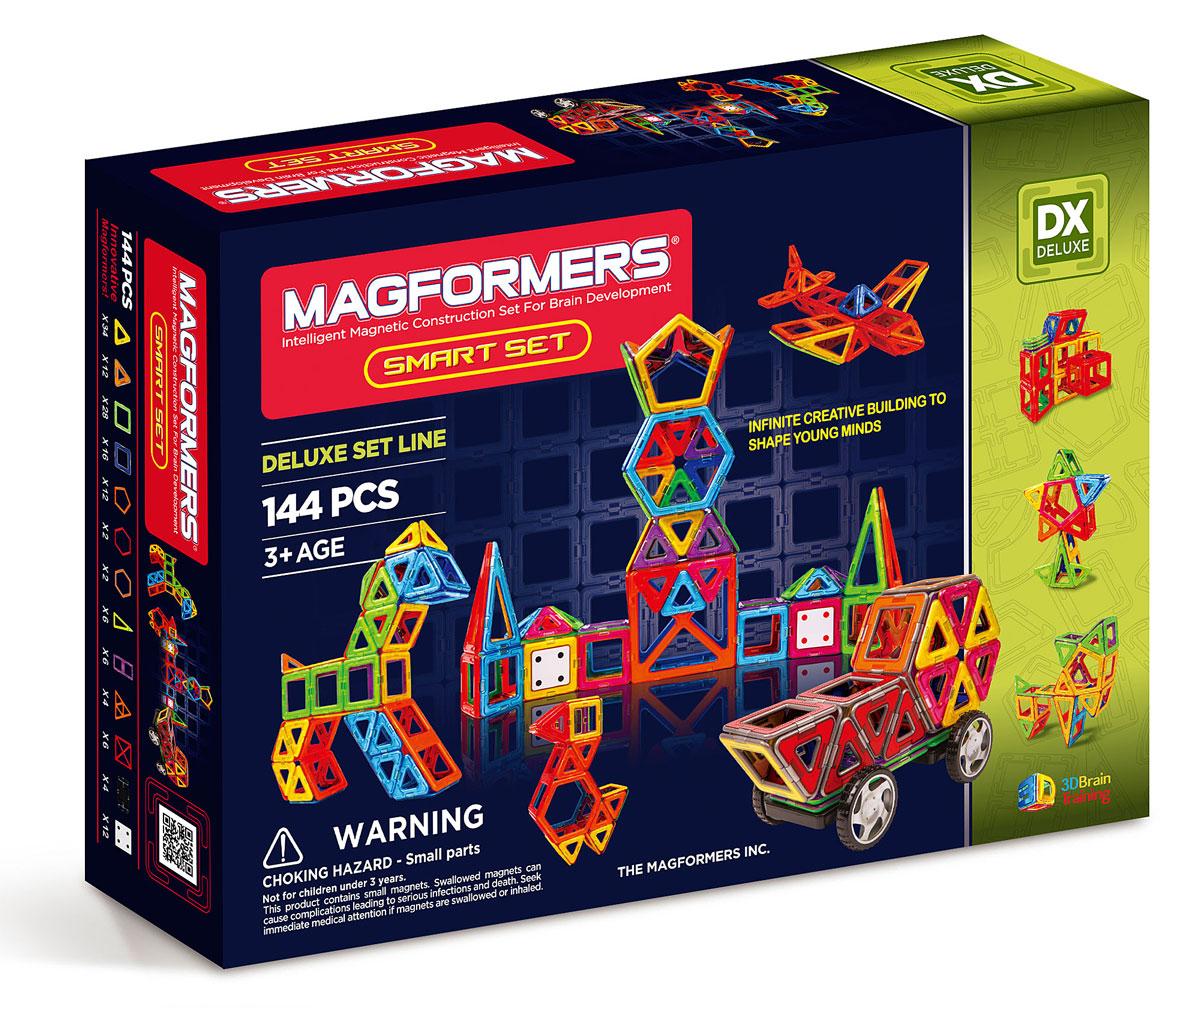 Magformers Магнитный конструктор Smart Set ubtech робот конструктор jimu inventor